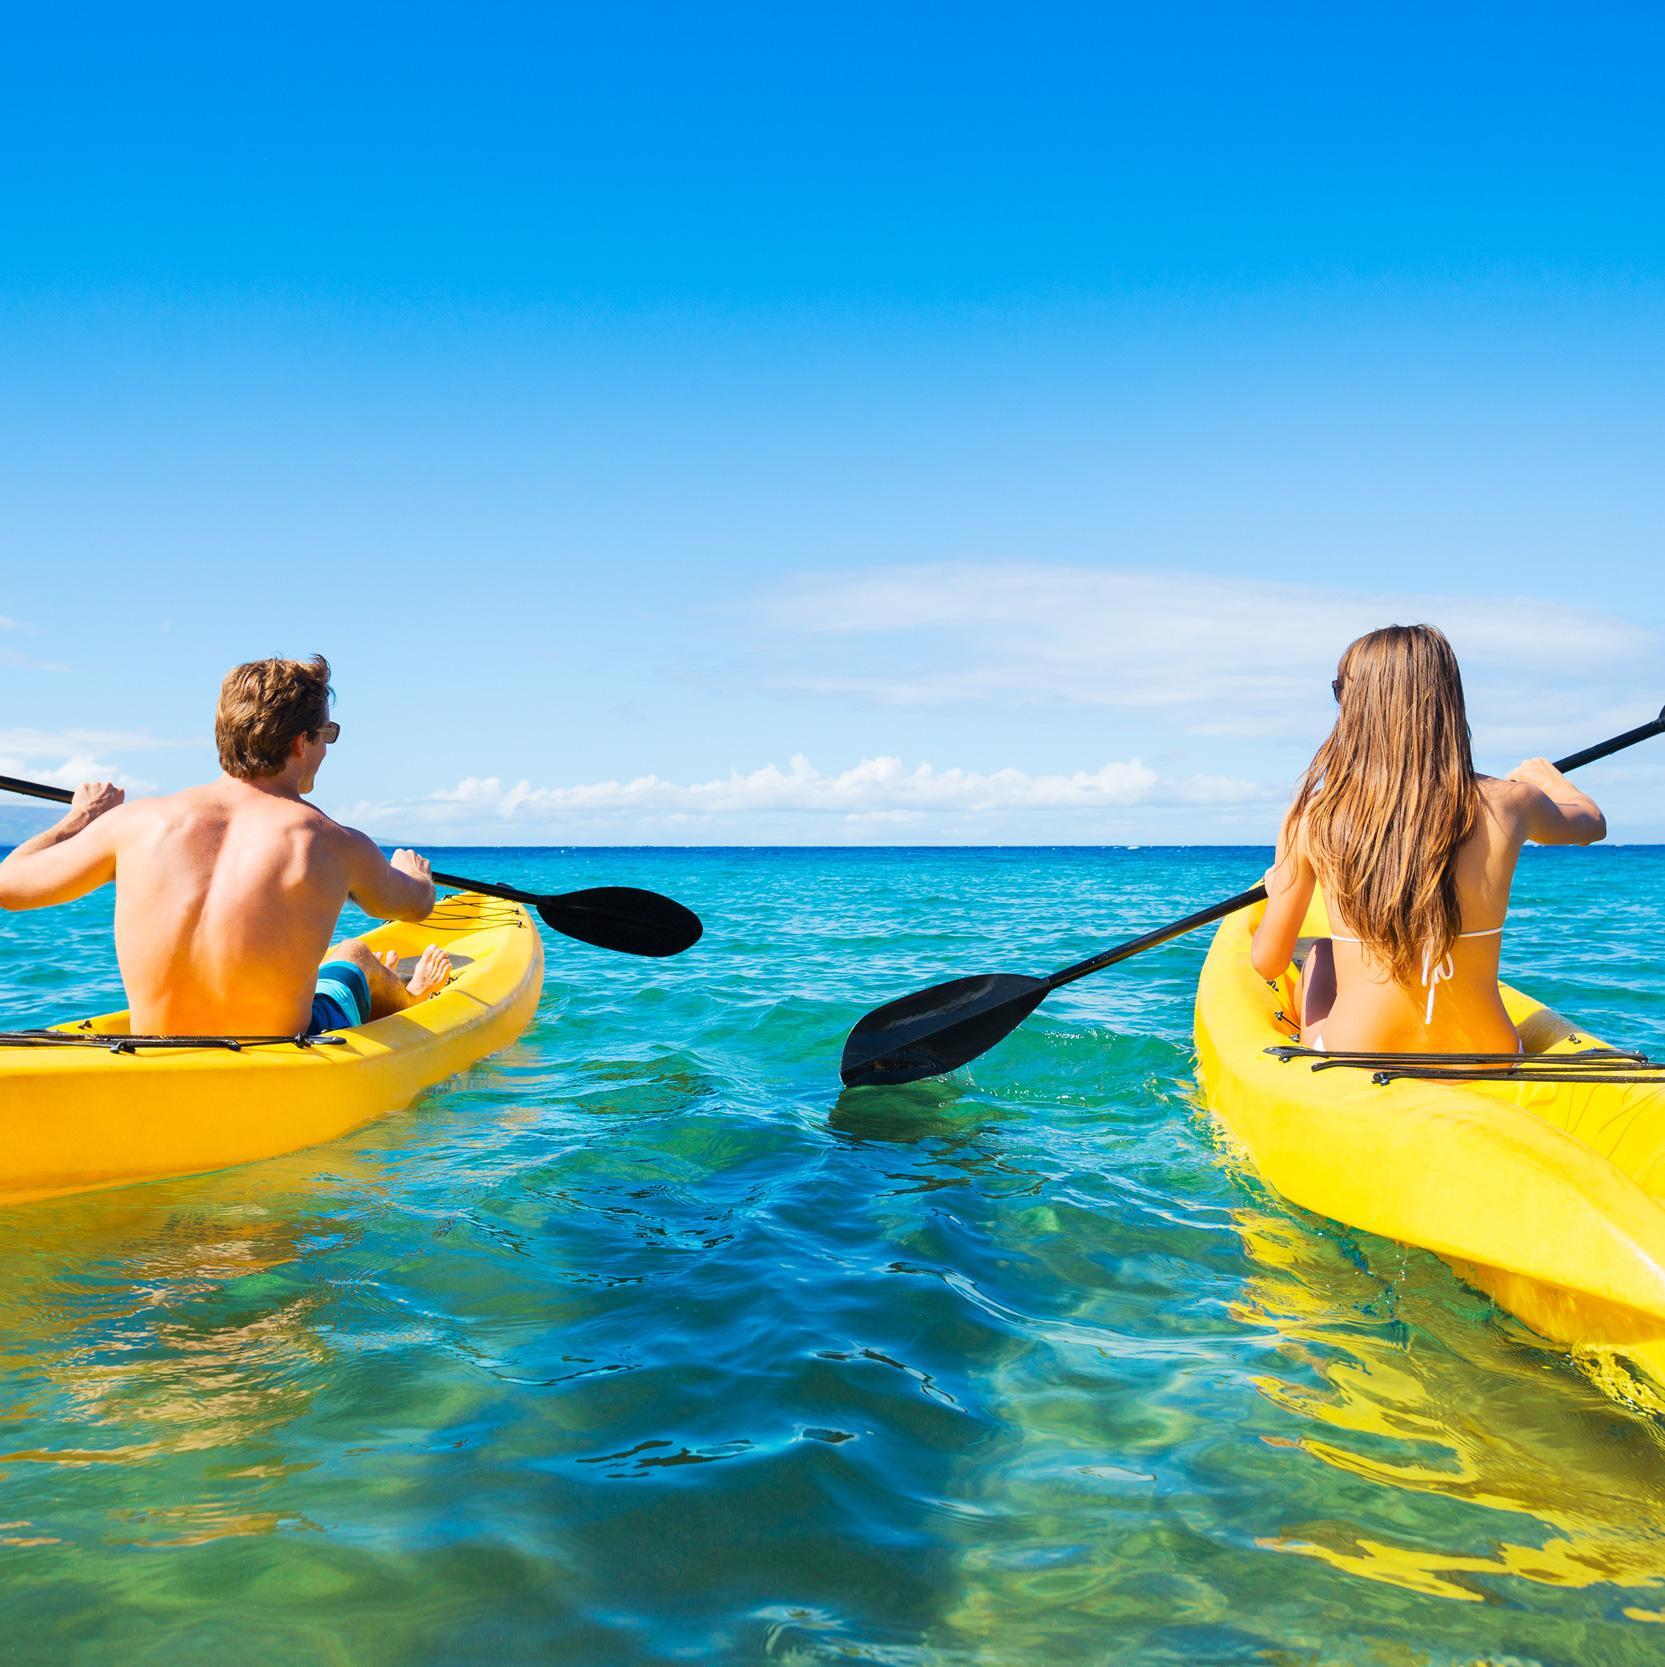 Kayaking awaits on your Caribbean vacation